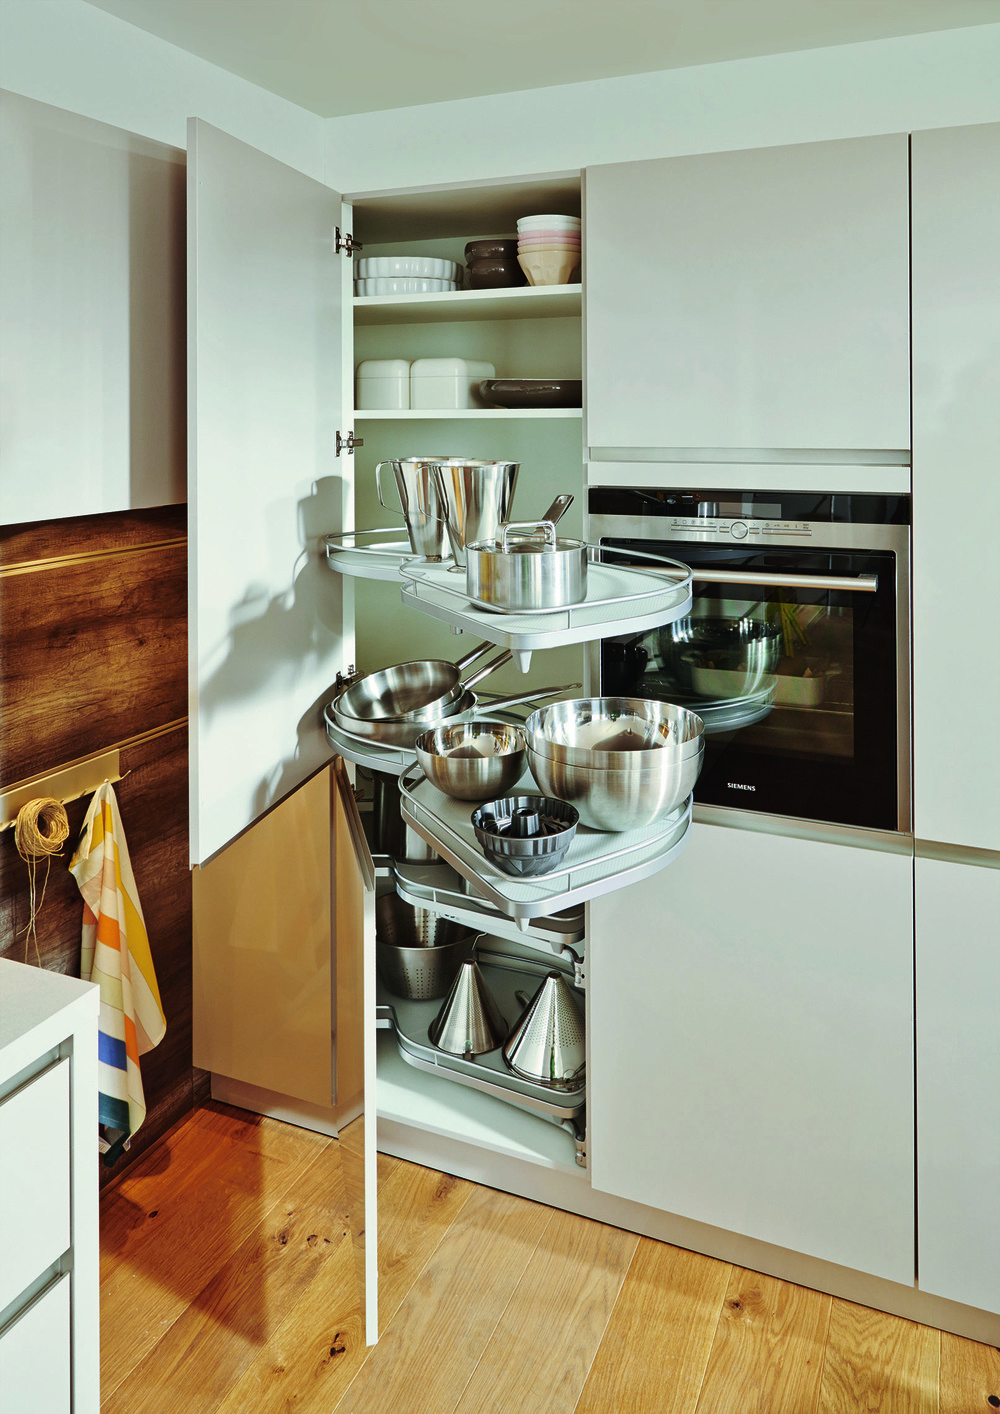 Best Eckschrank Für Küche Photos - Milbank.us - milbank.us